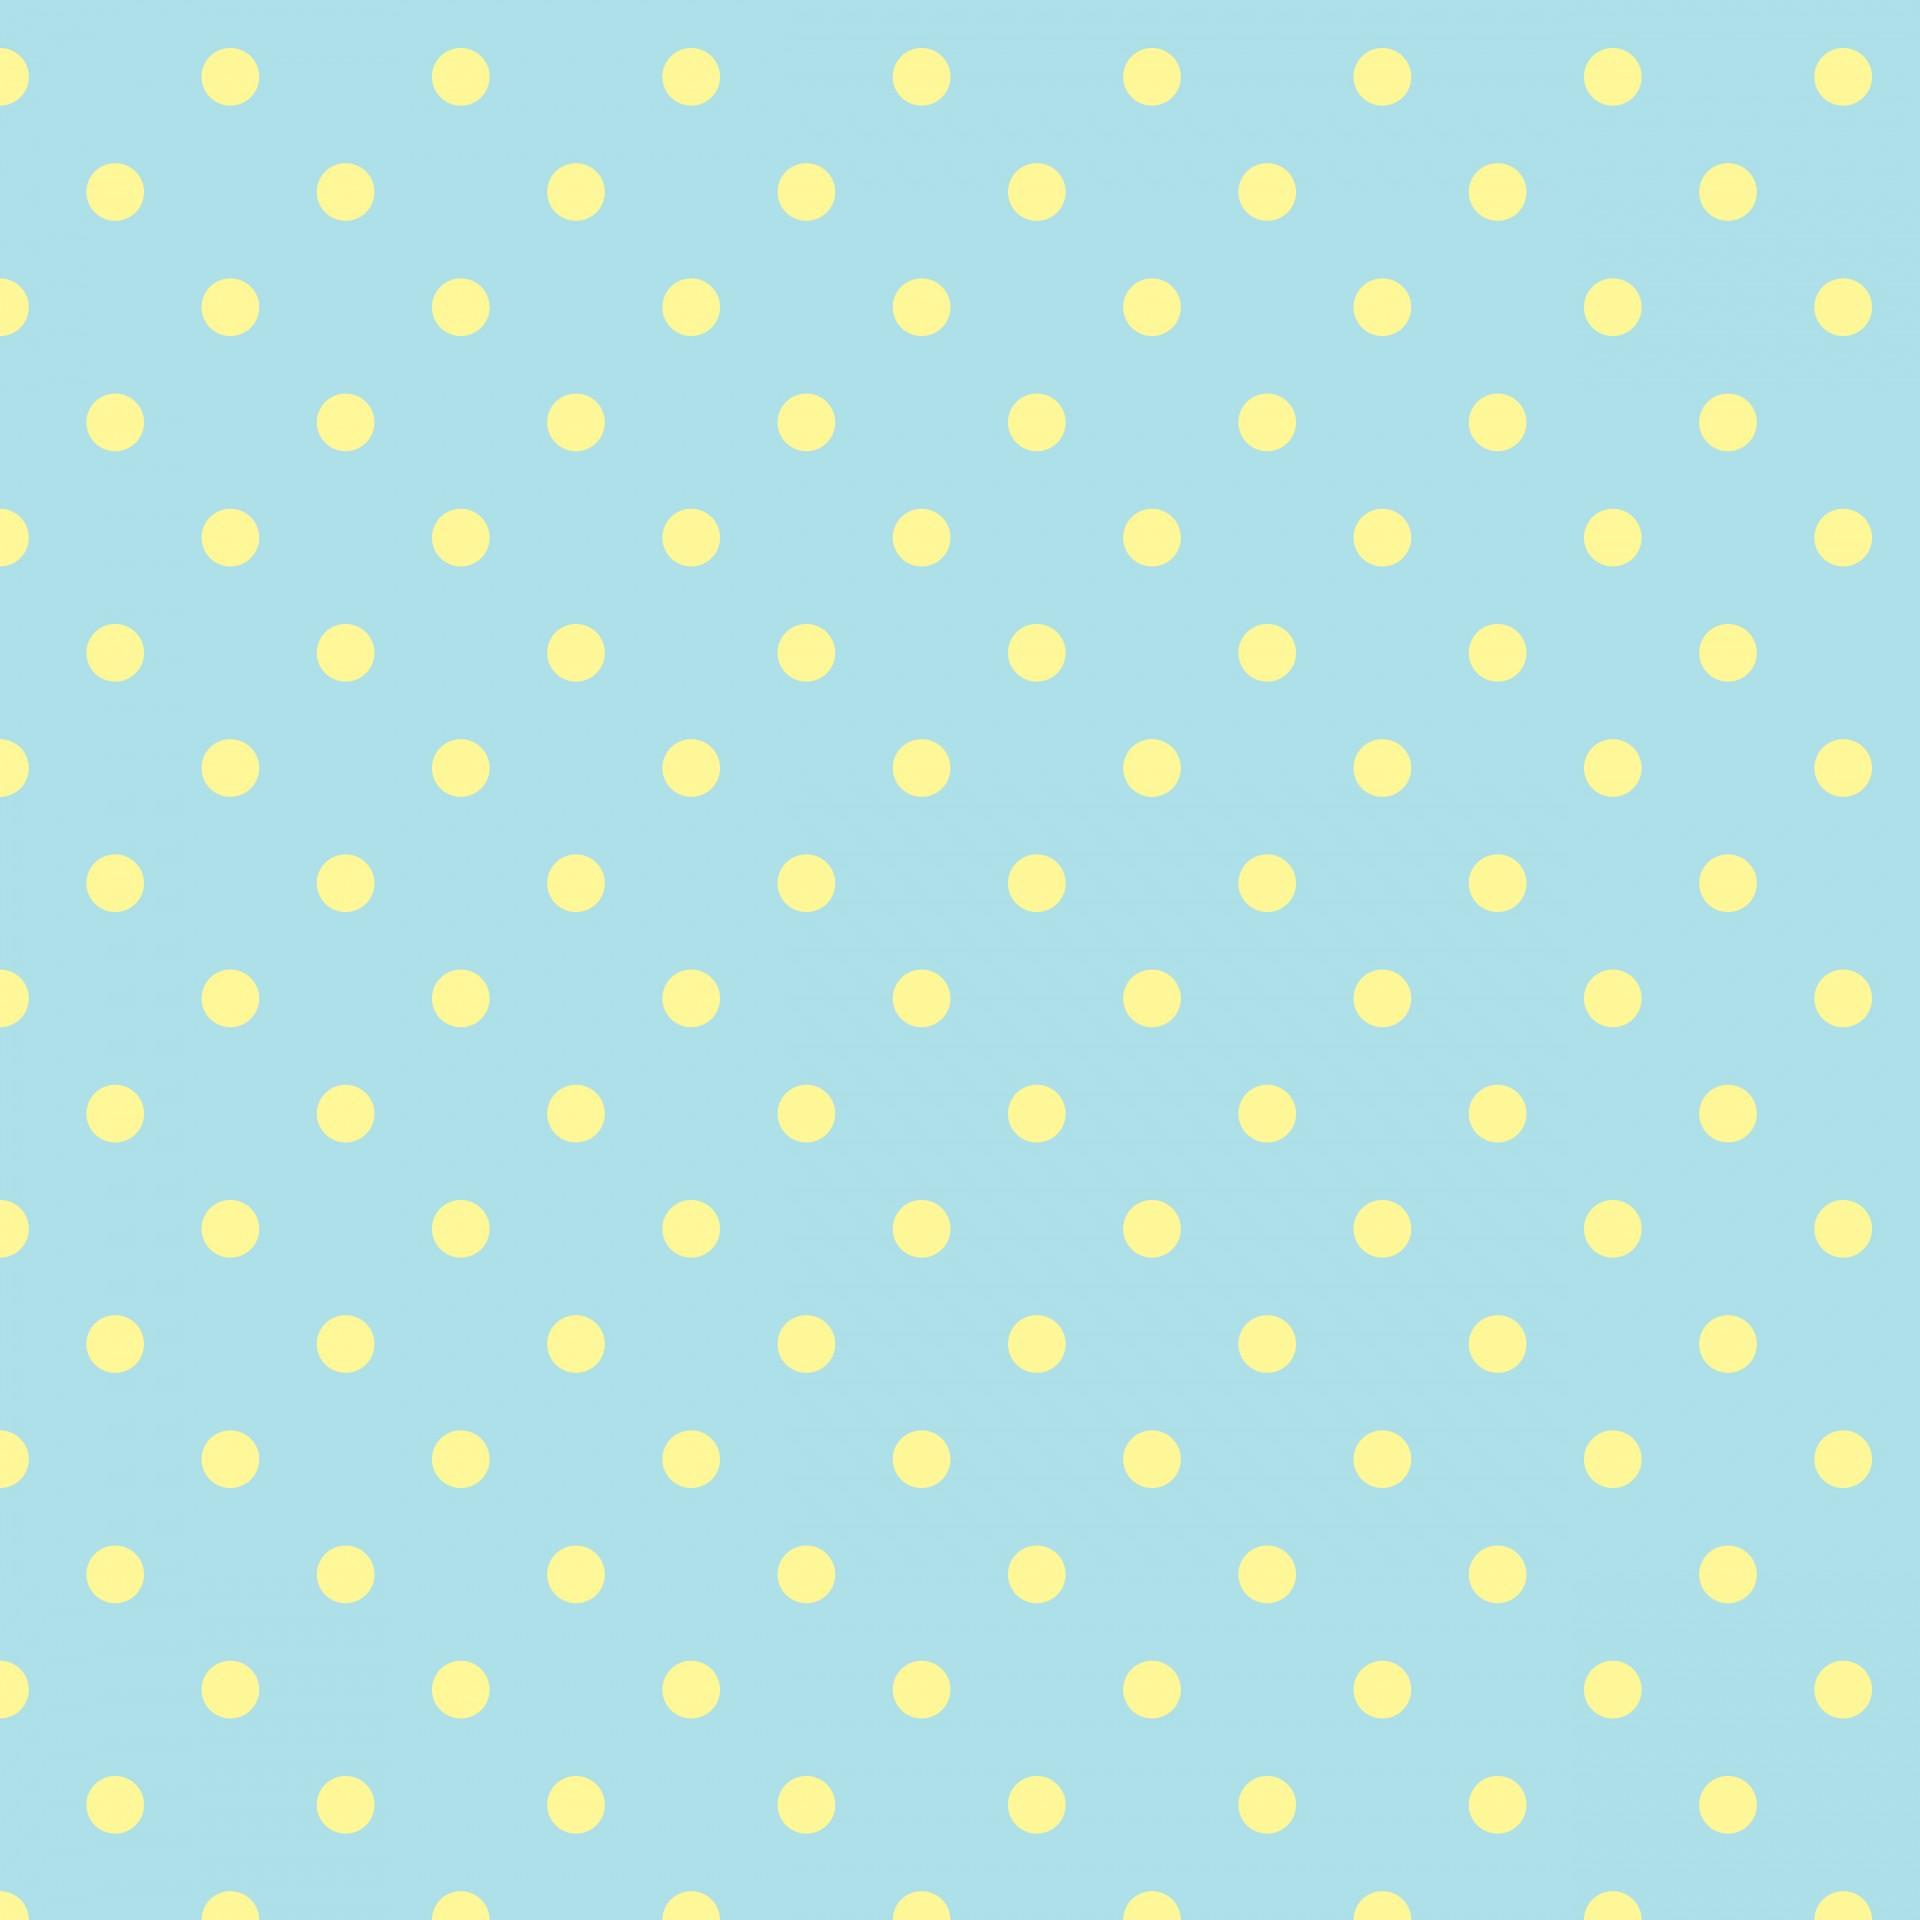 images Blue Yellow Polka Dots polka dots blau gelb kostenloses stock